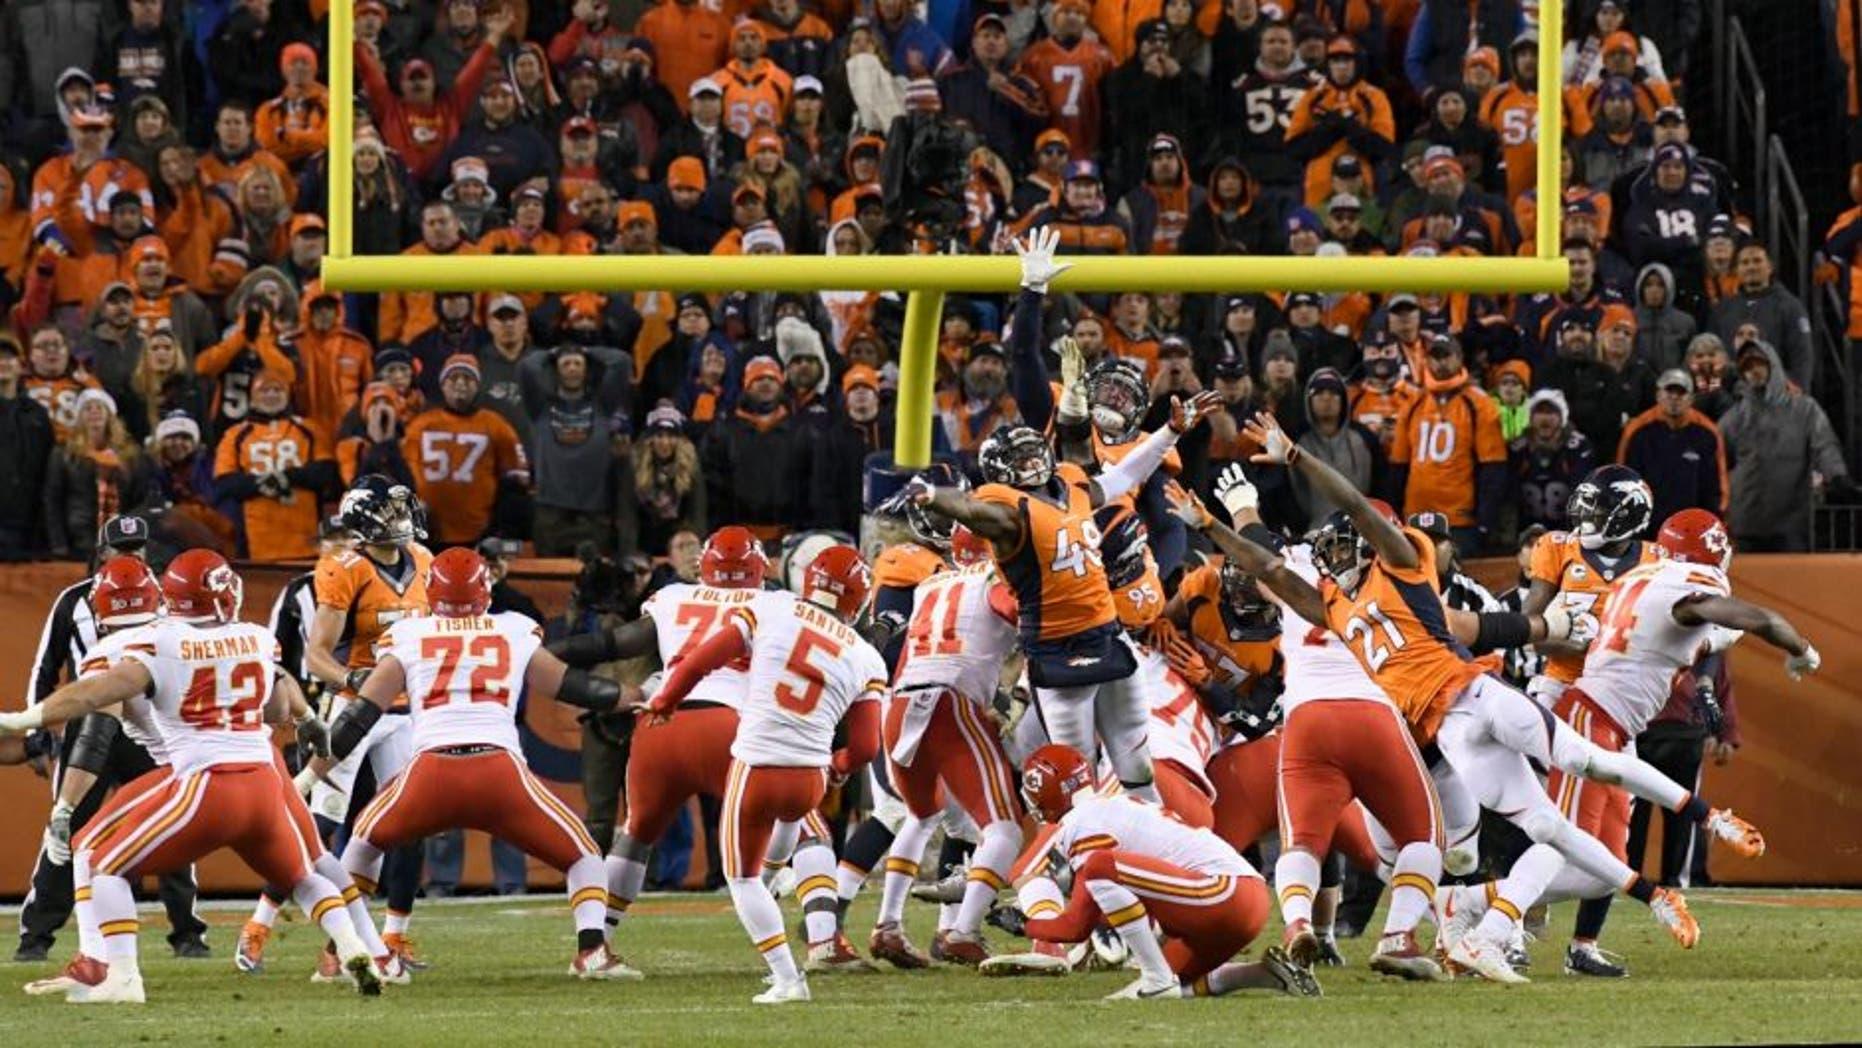 DENVER, CO - NOVEMBER 27: Kansas City Chiefs kicker Cairo Santos (5) kicks the winning field goal in overtime against the Denver Broncos November 27, 2016 at Sports Authority Field at Mile High Stadium. Kansas City Chiefs defeated the Denver Broncos 30-27 for the overtime win. (Photo By John Leyba/The Denver Post via Getty Images)